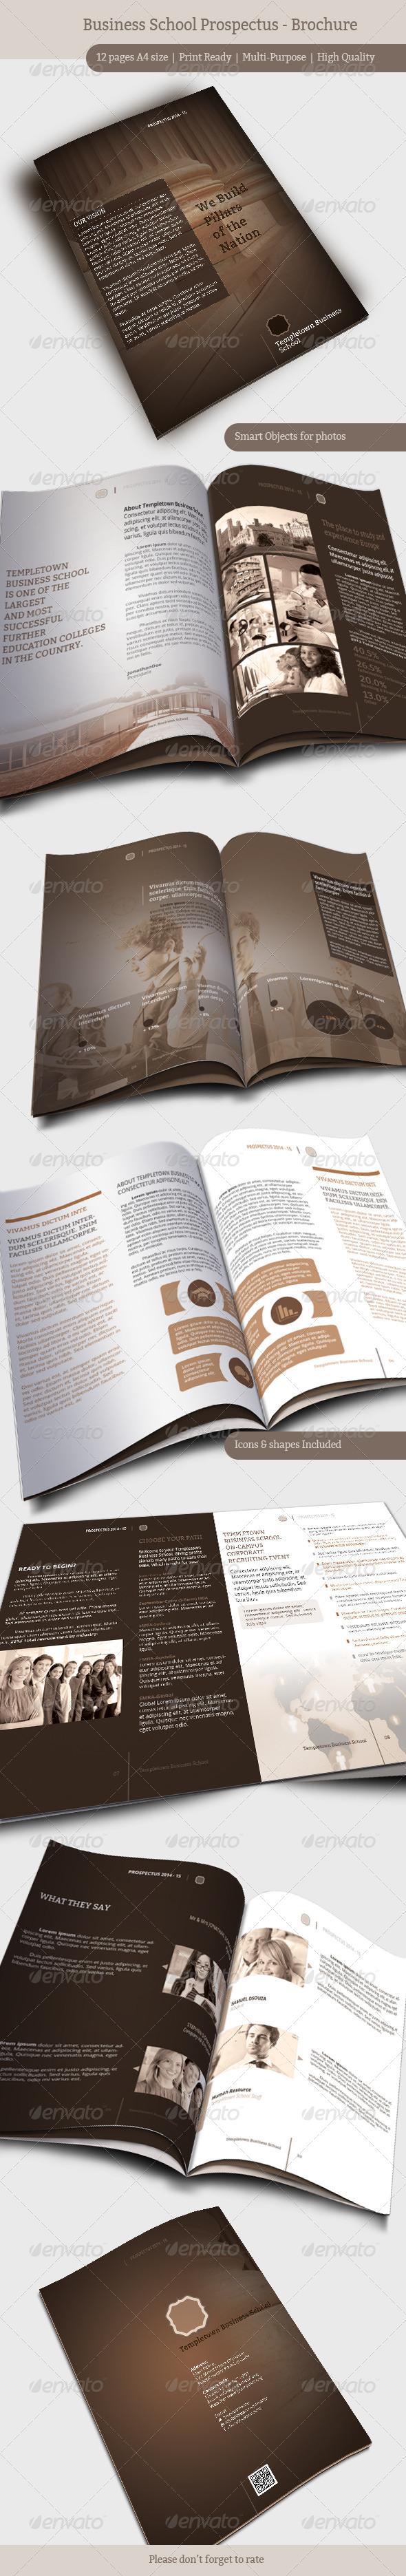 GraphicRiver Business School Prospectus Brochure 6873576